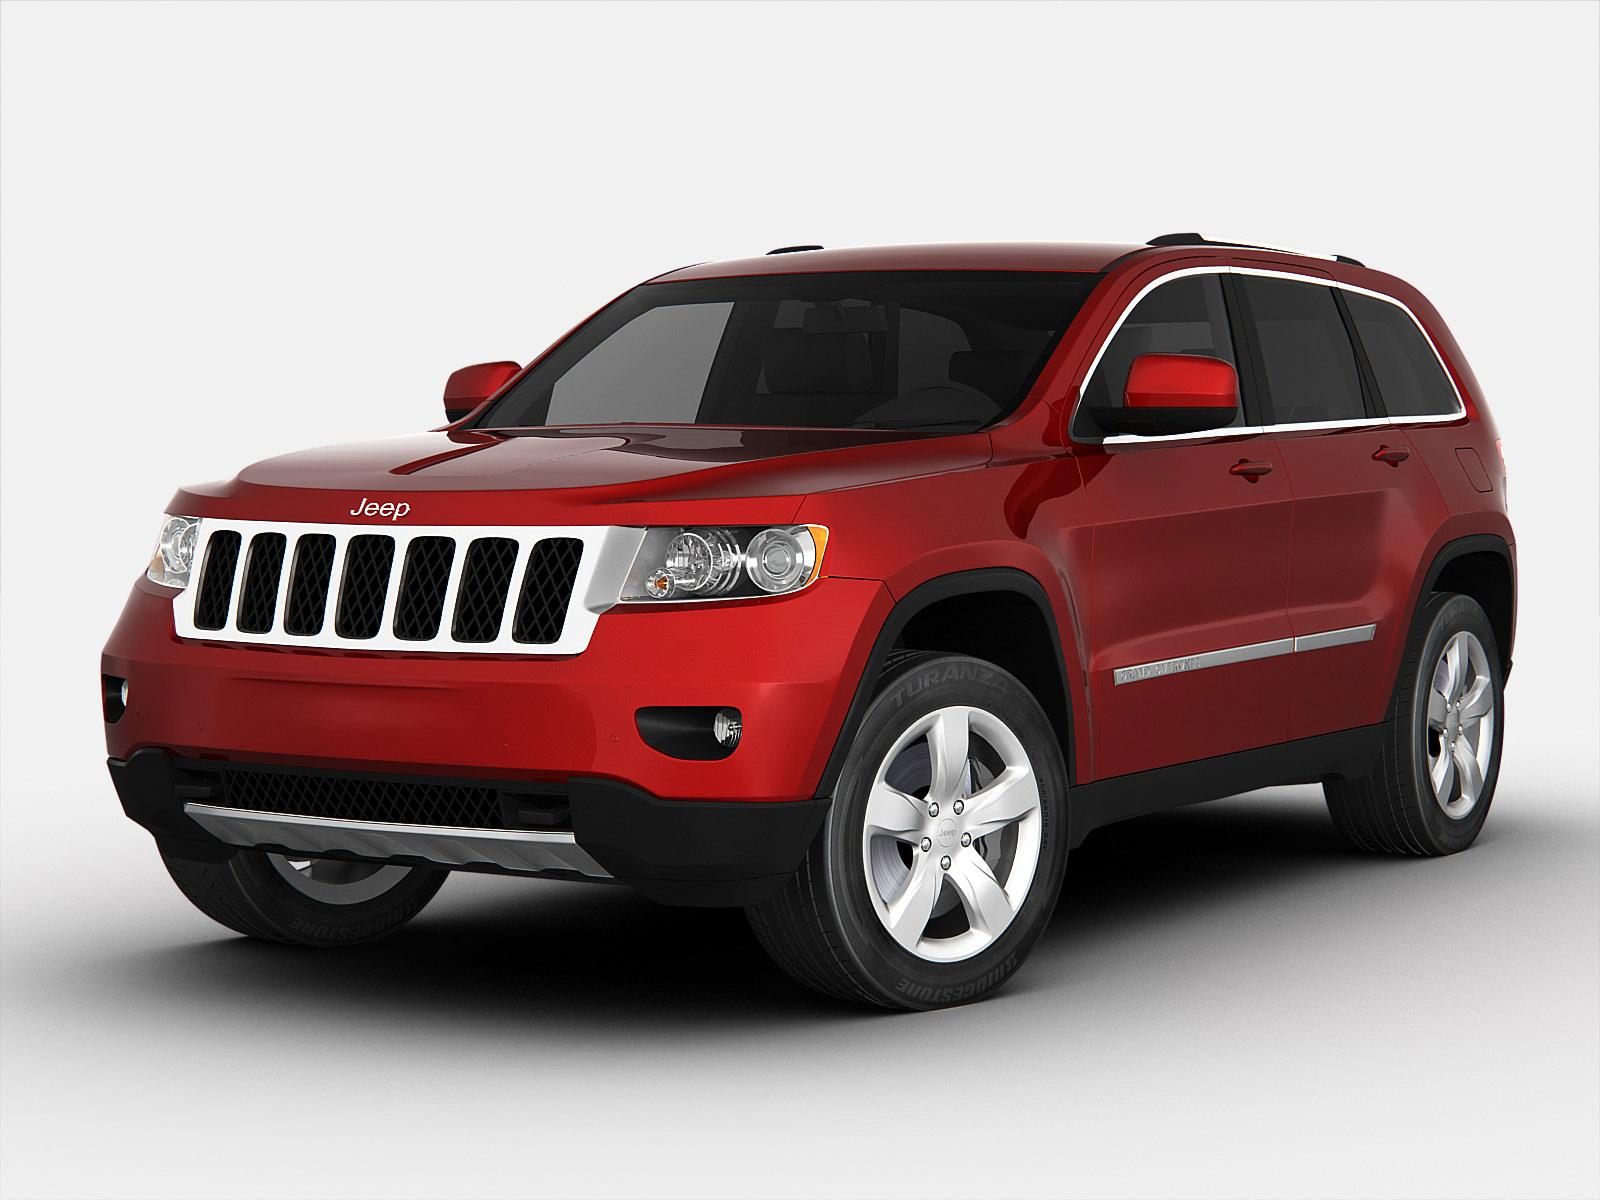 jeep grand cherokee 2012 3d model max obj 3ds fbx. Black Bedroom Furniture Sets. Home Design Ideas